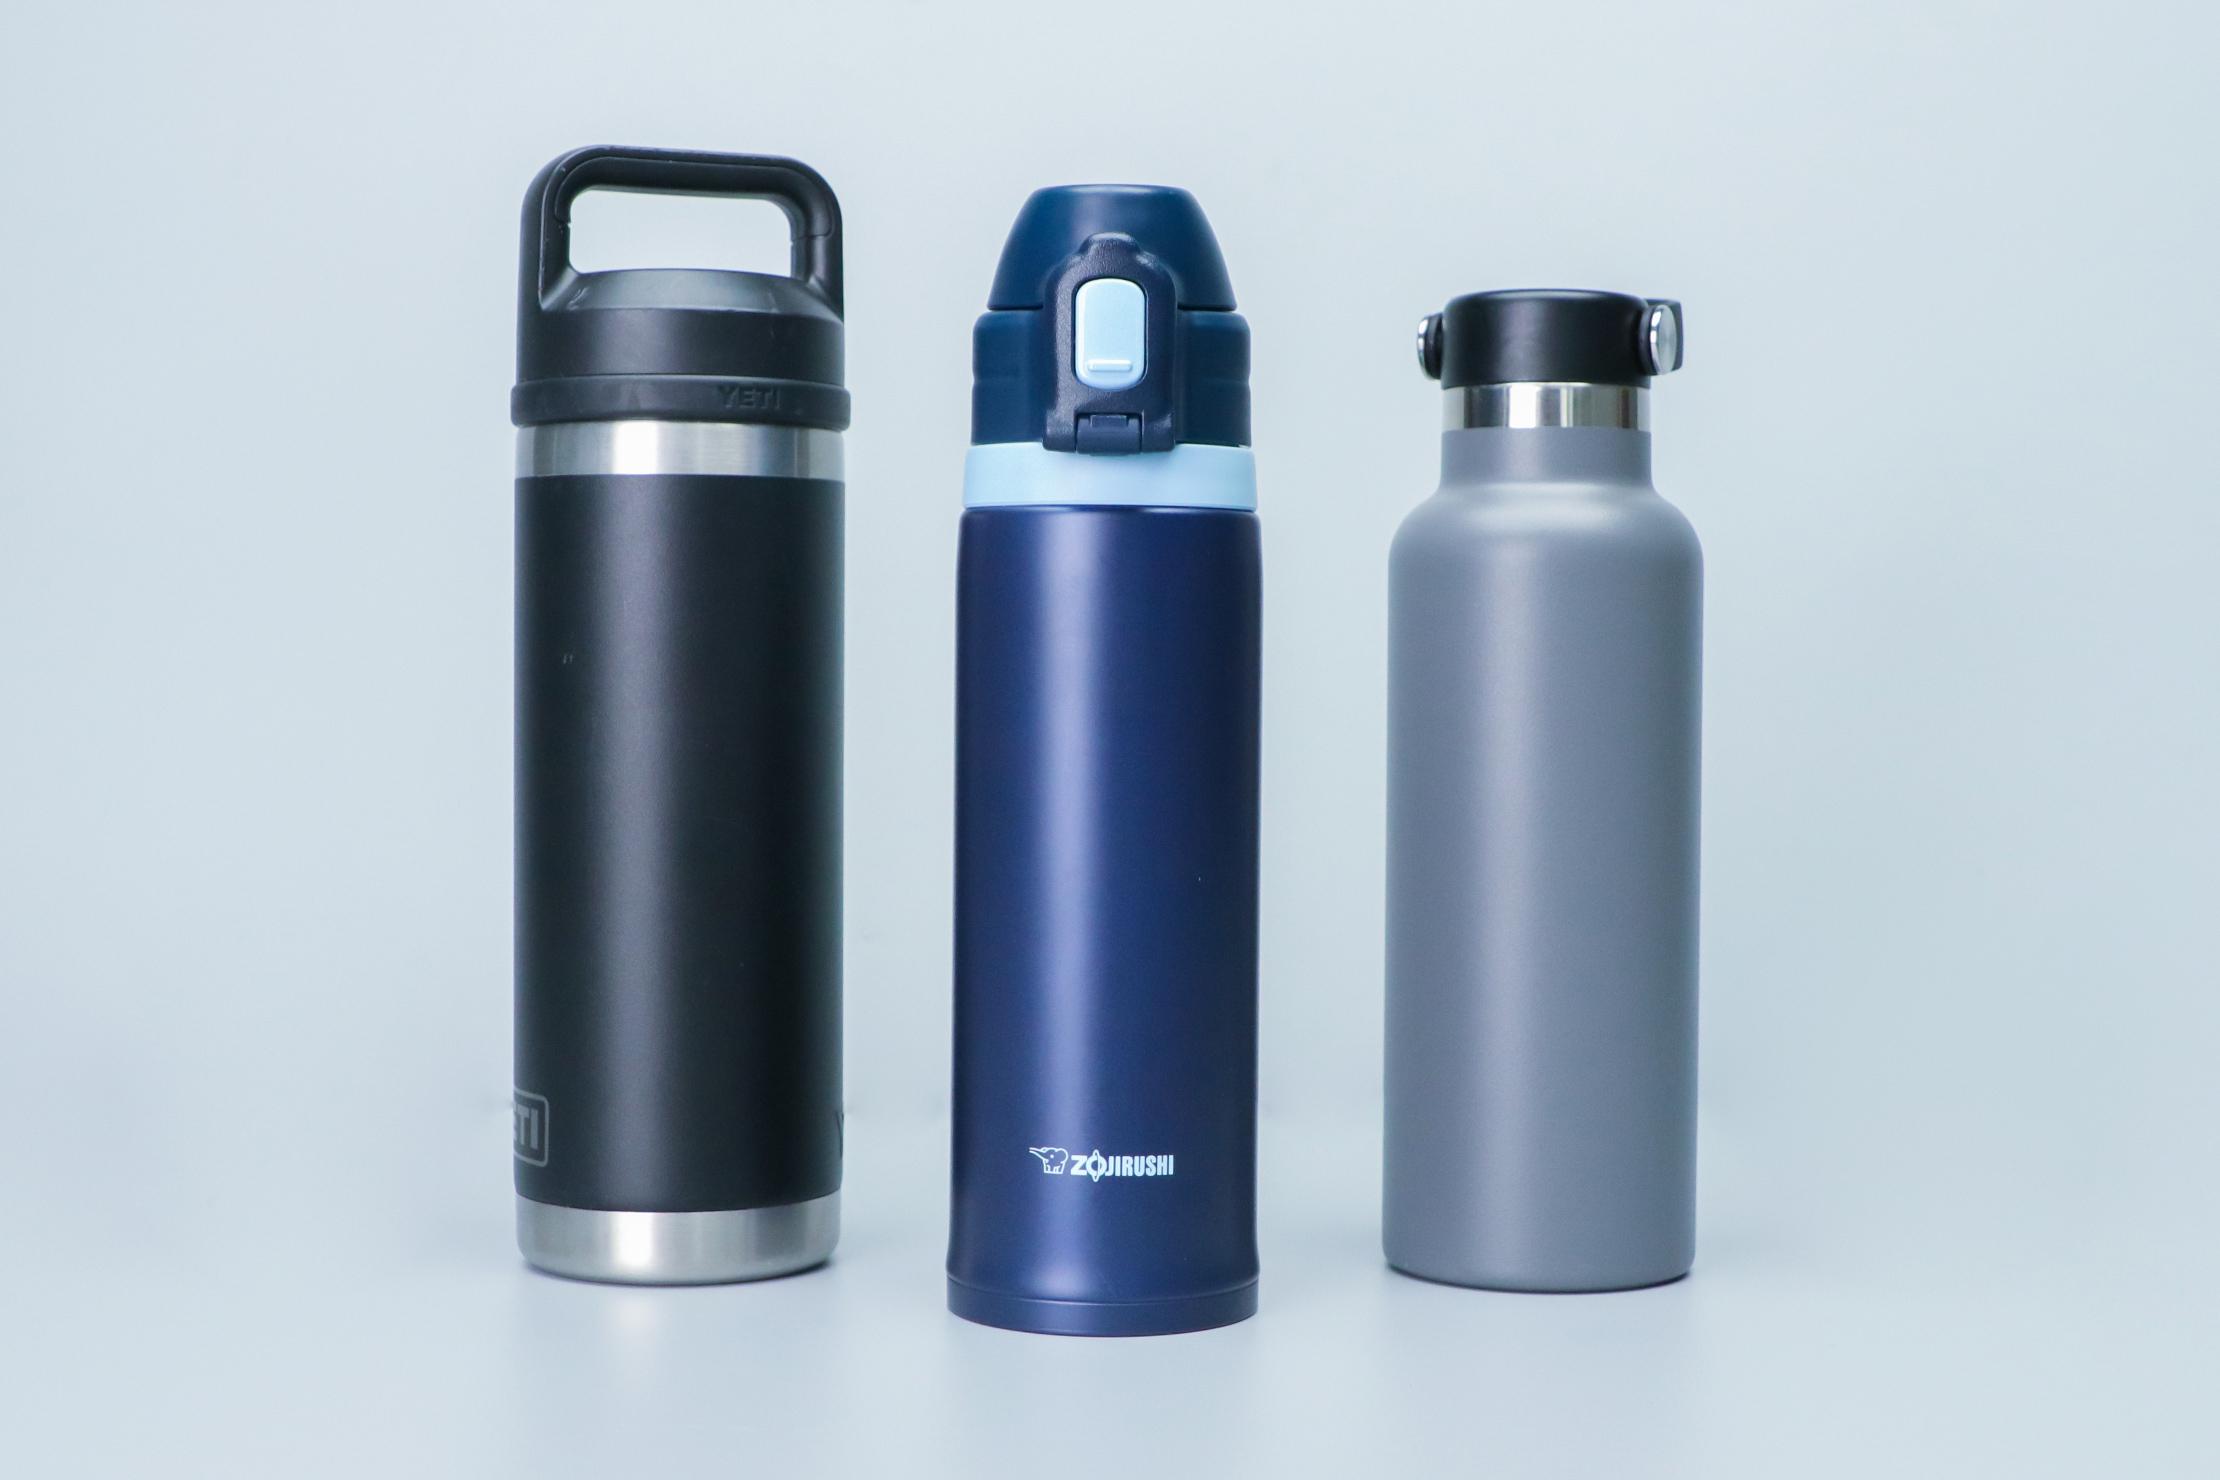 Zojirushi Cool Bottle with YETI Hydroflask